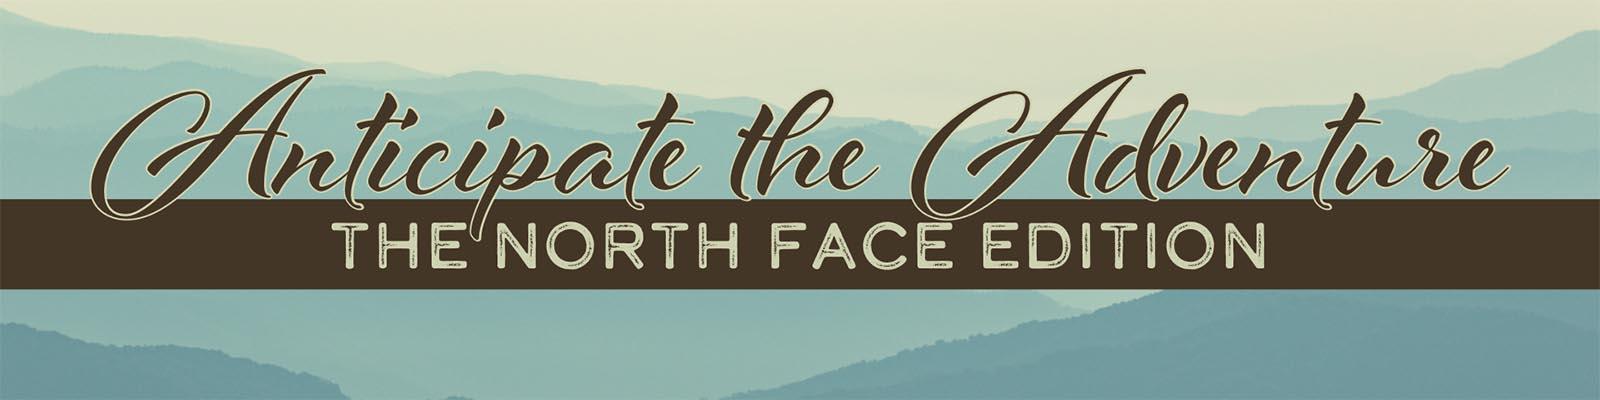 Anticipate the Adventure North Face Edition